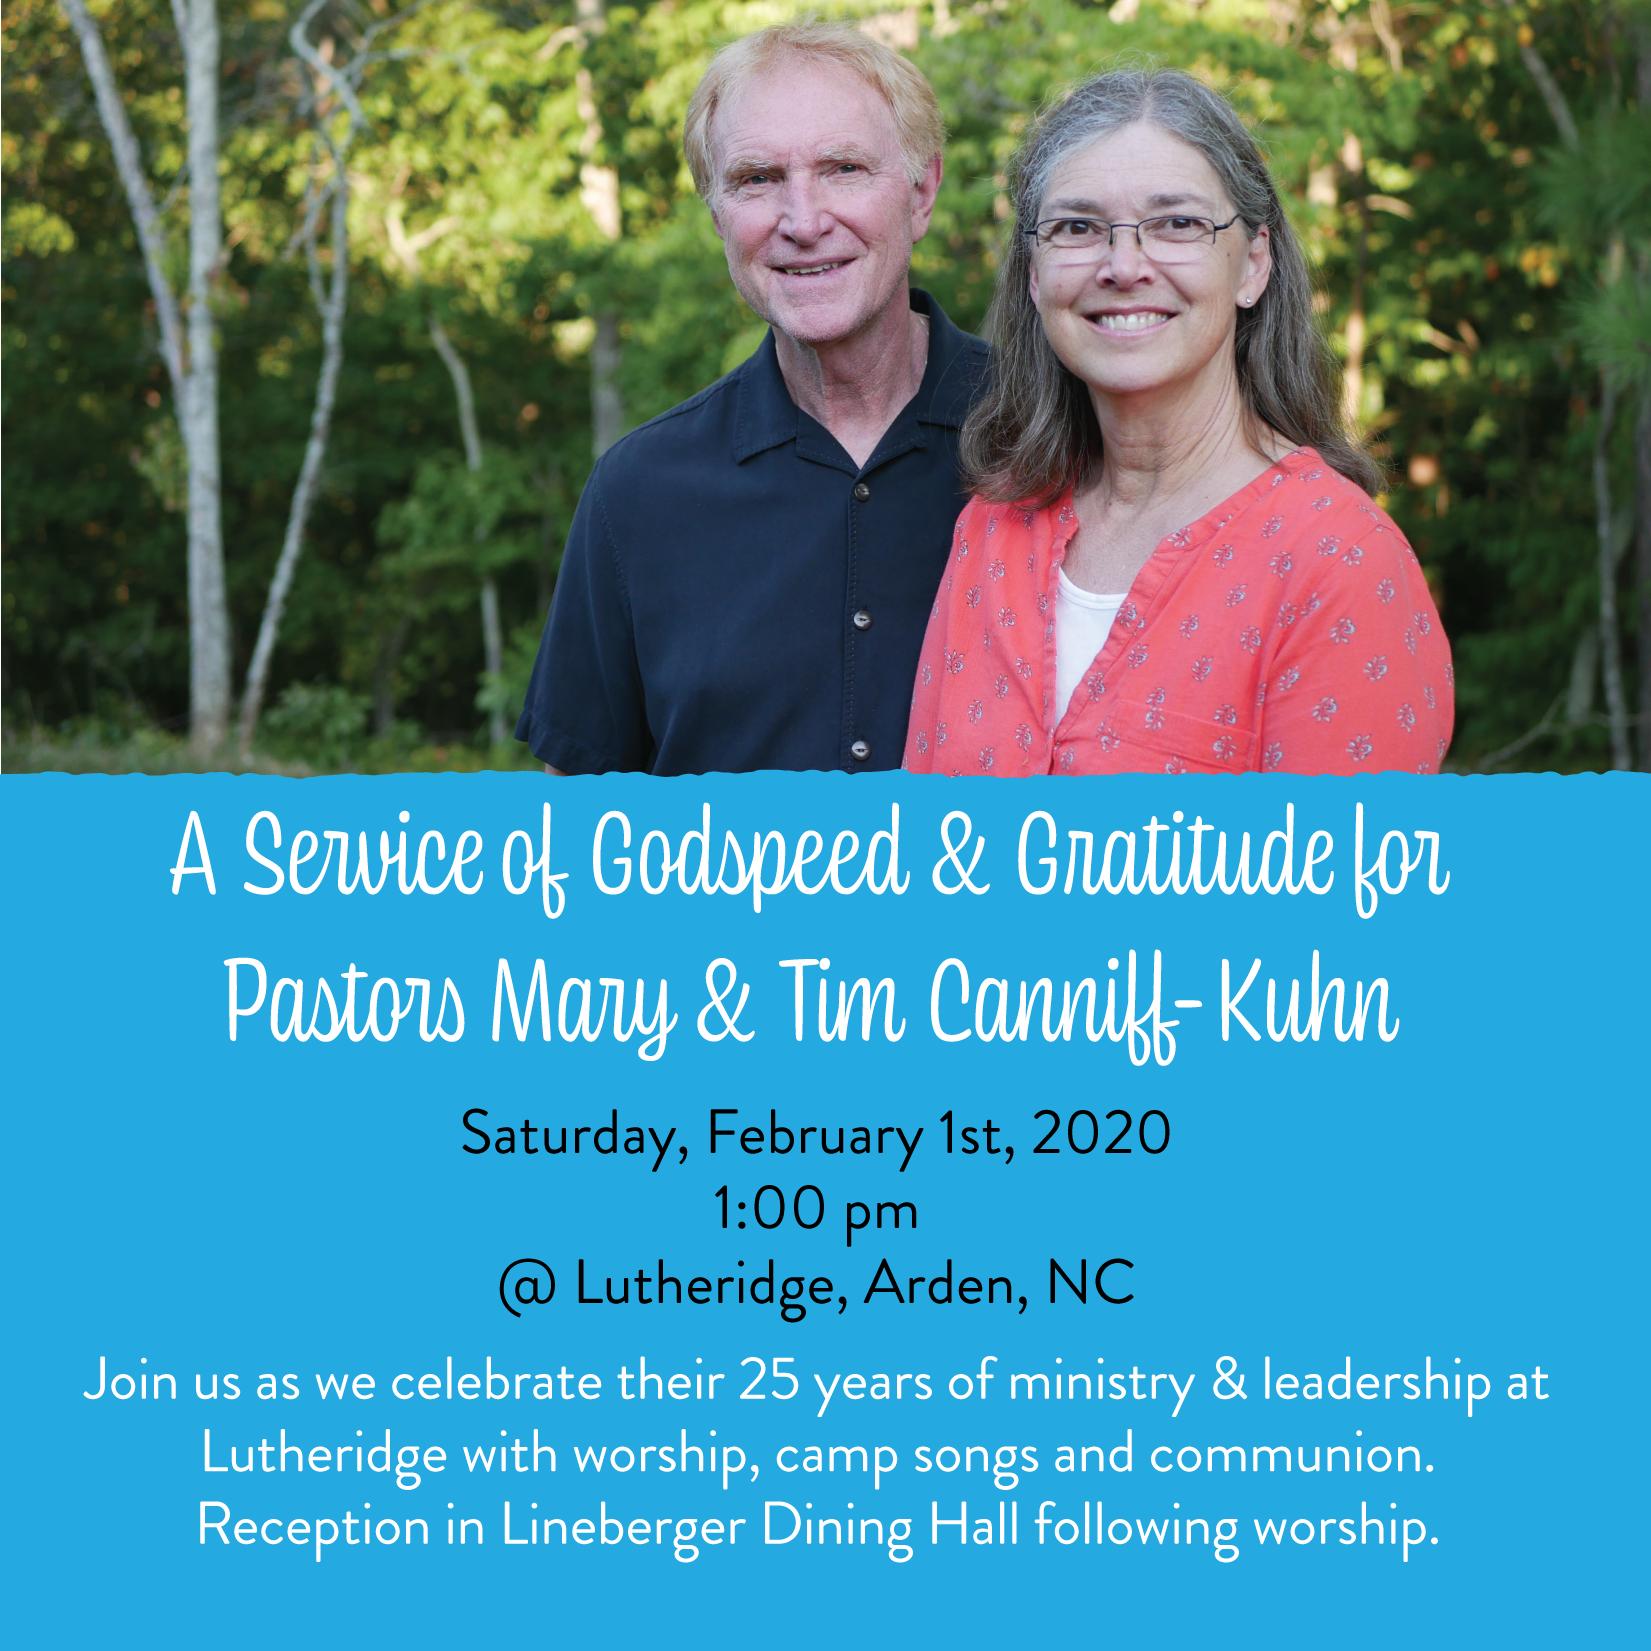 Celebration of Pastors Mary & Tim Canniff-Kuhn